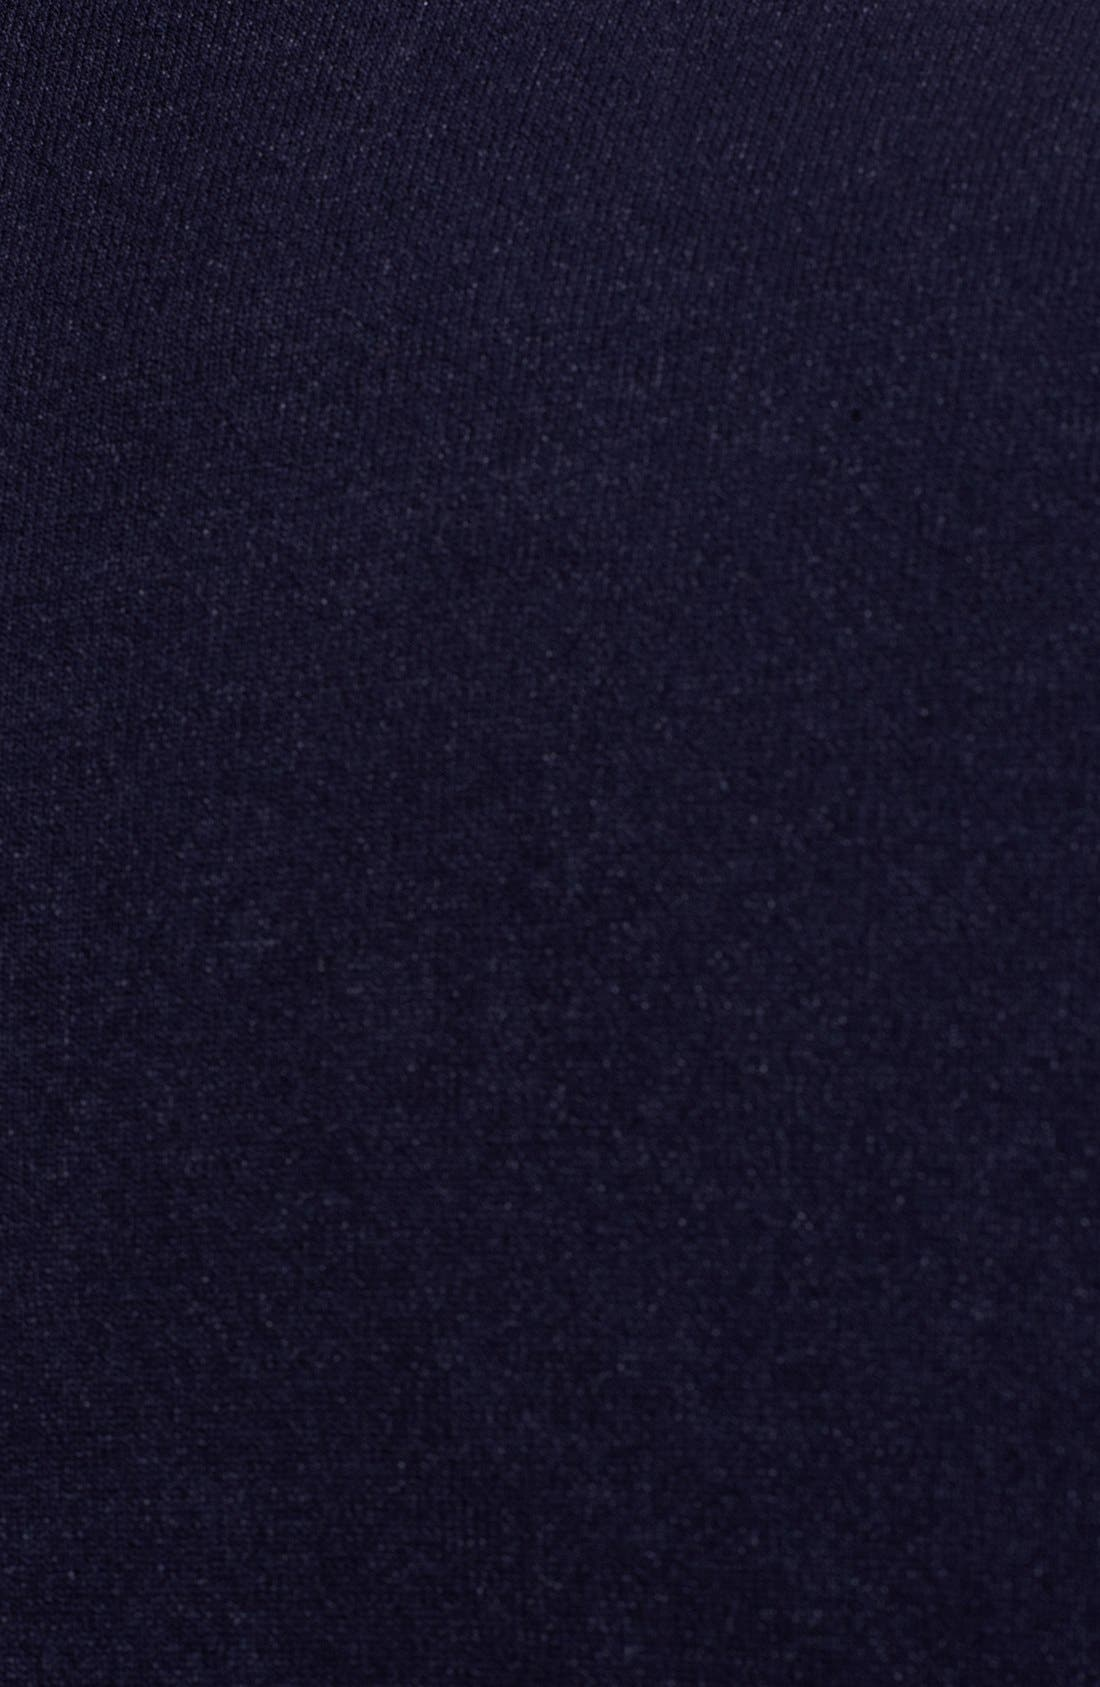 Alternate Image 3  - Armani Collezioni Mock Neck Zip Sweater